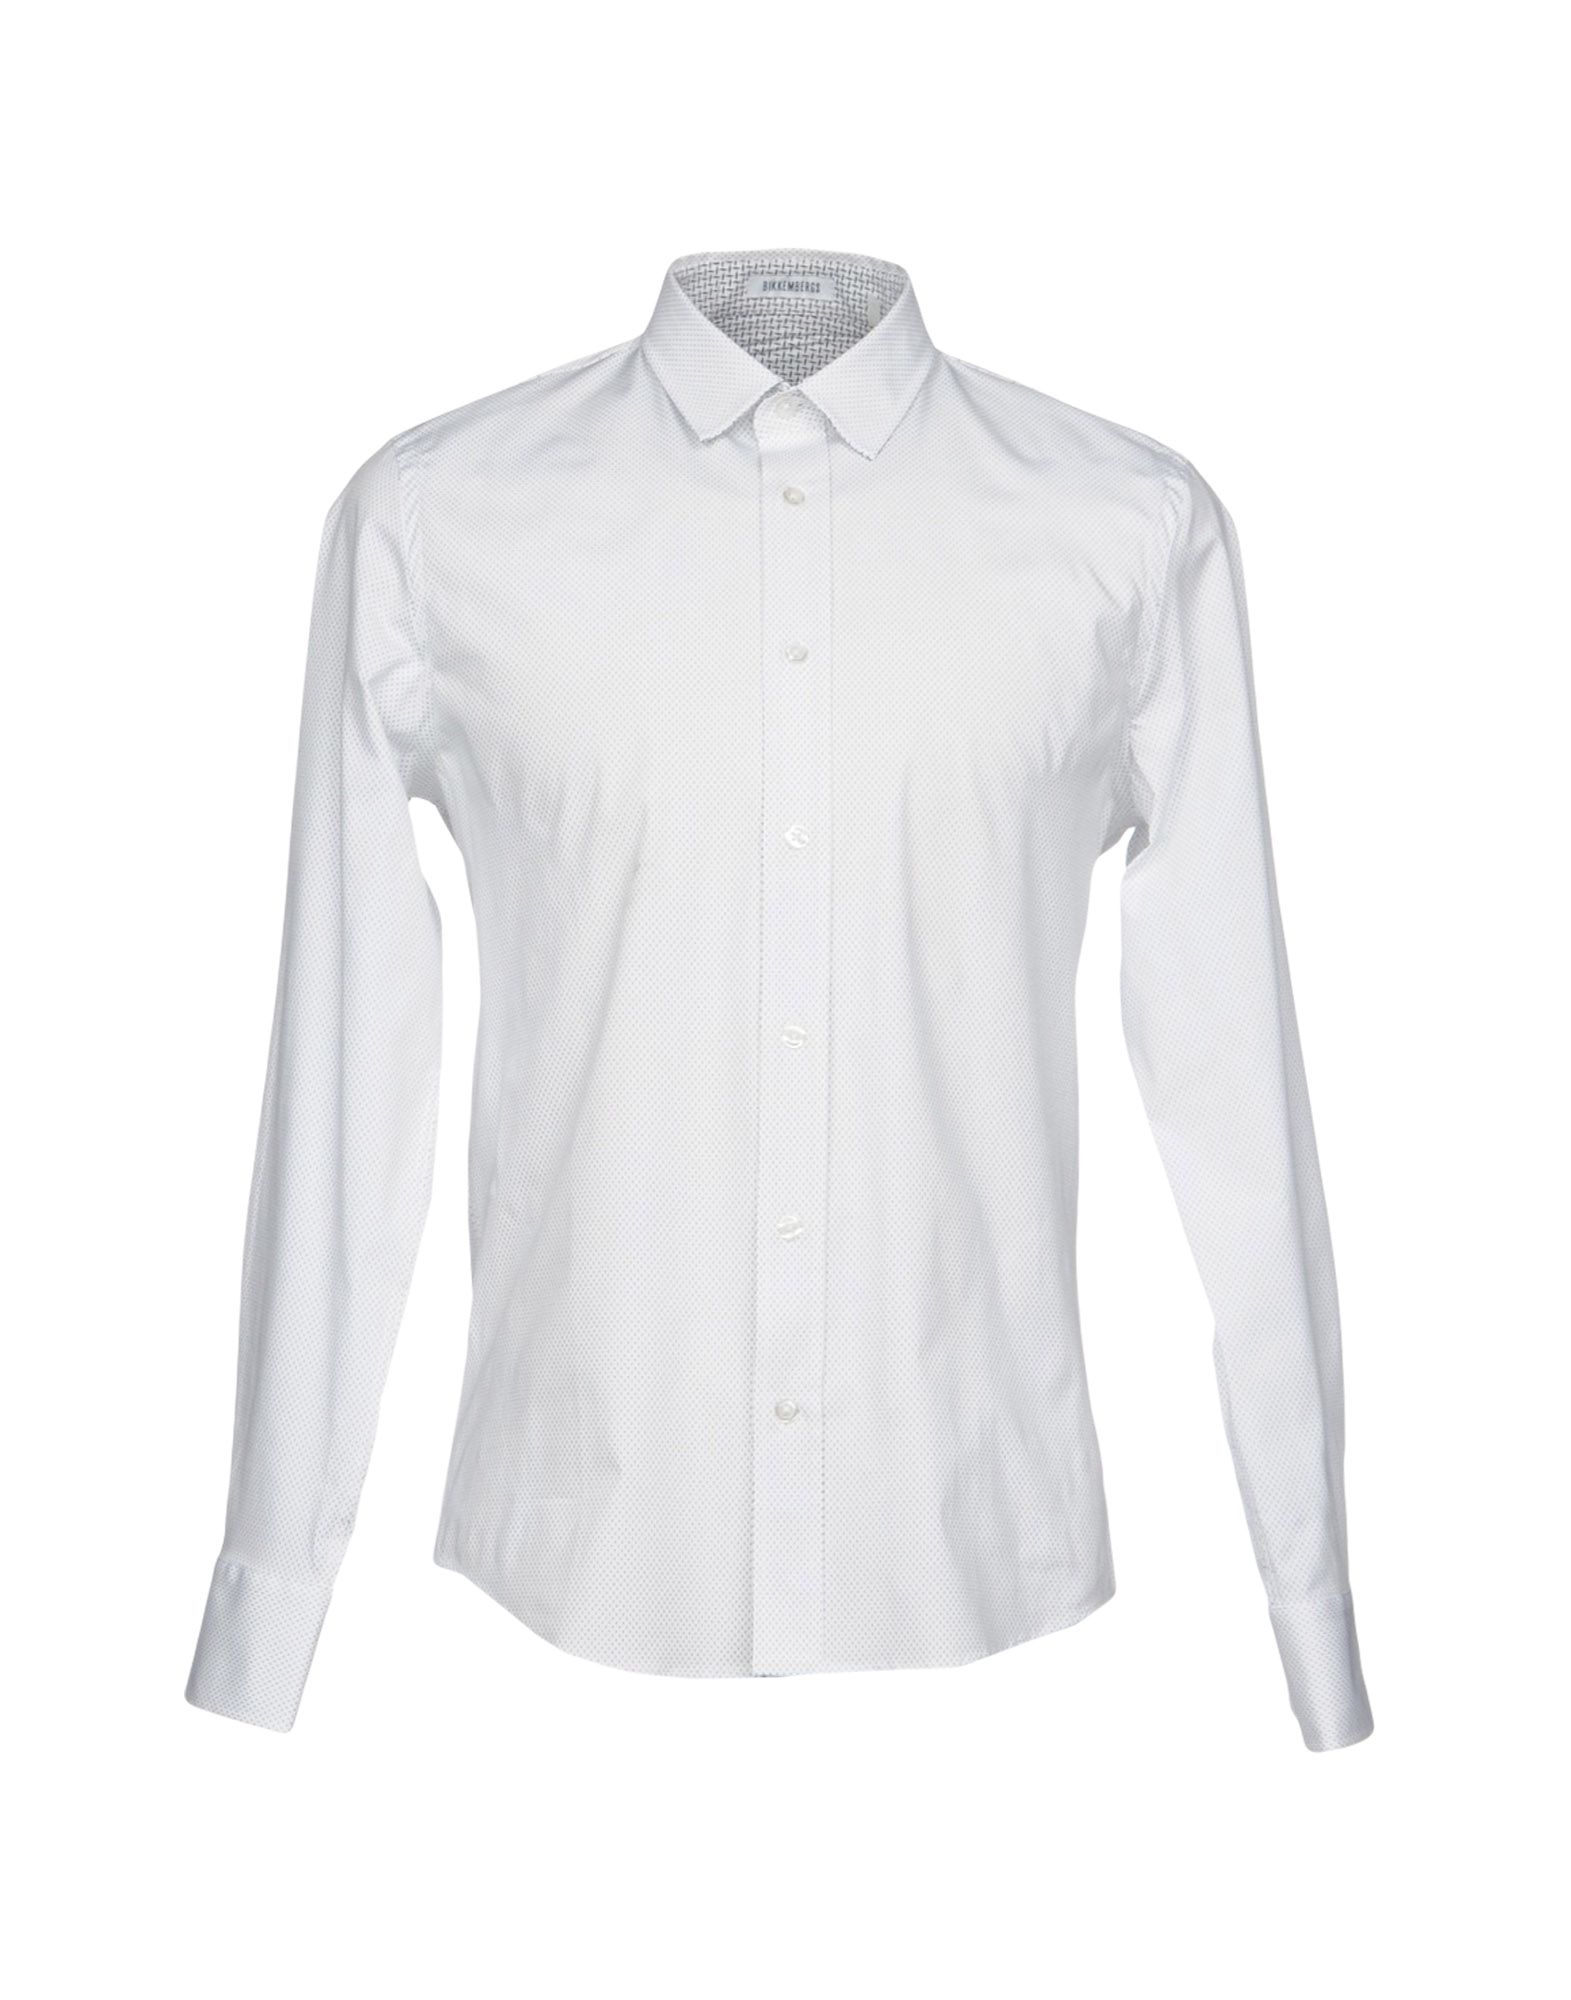 Camicia Fantasia Bikkembergs Uomo - Acquista online su